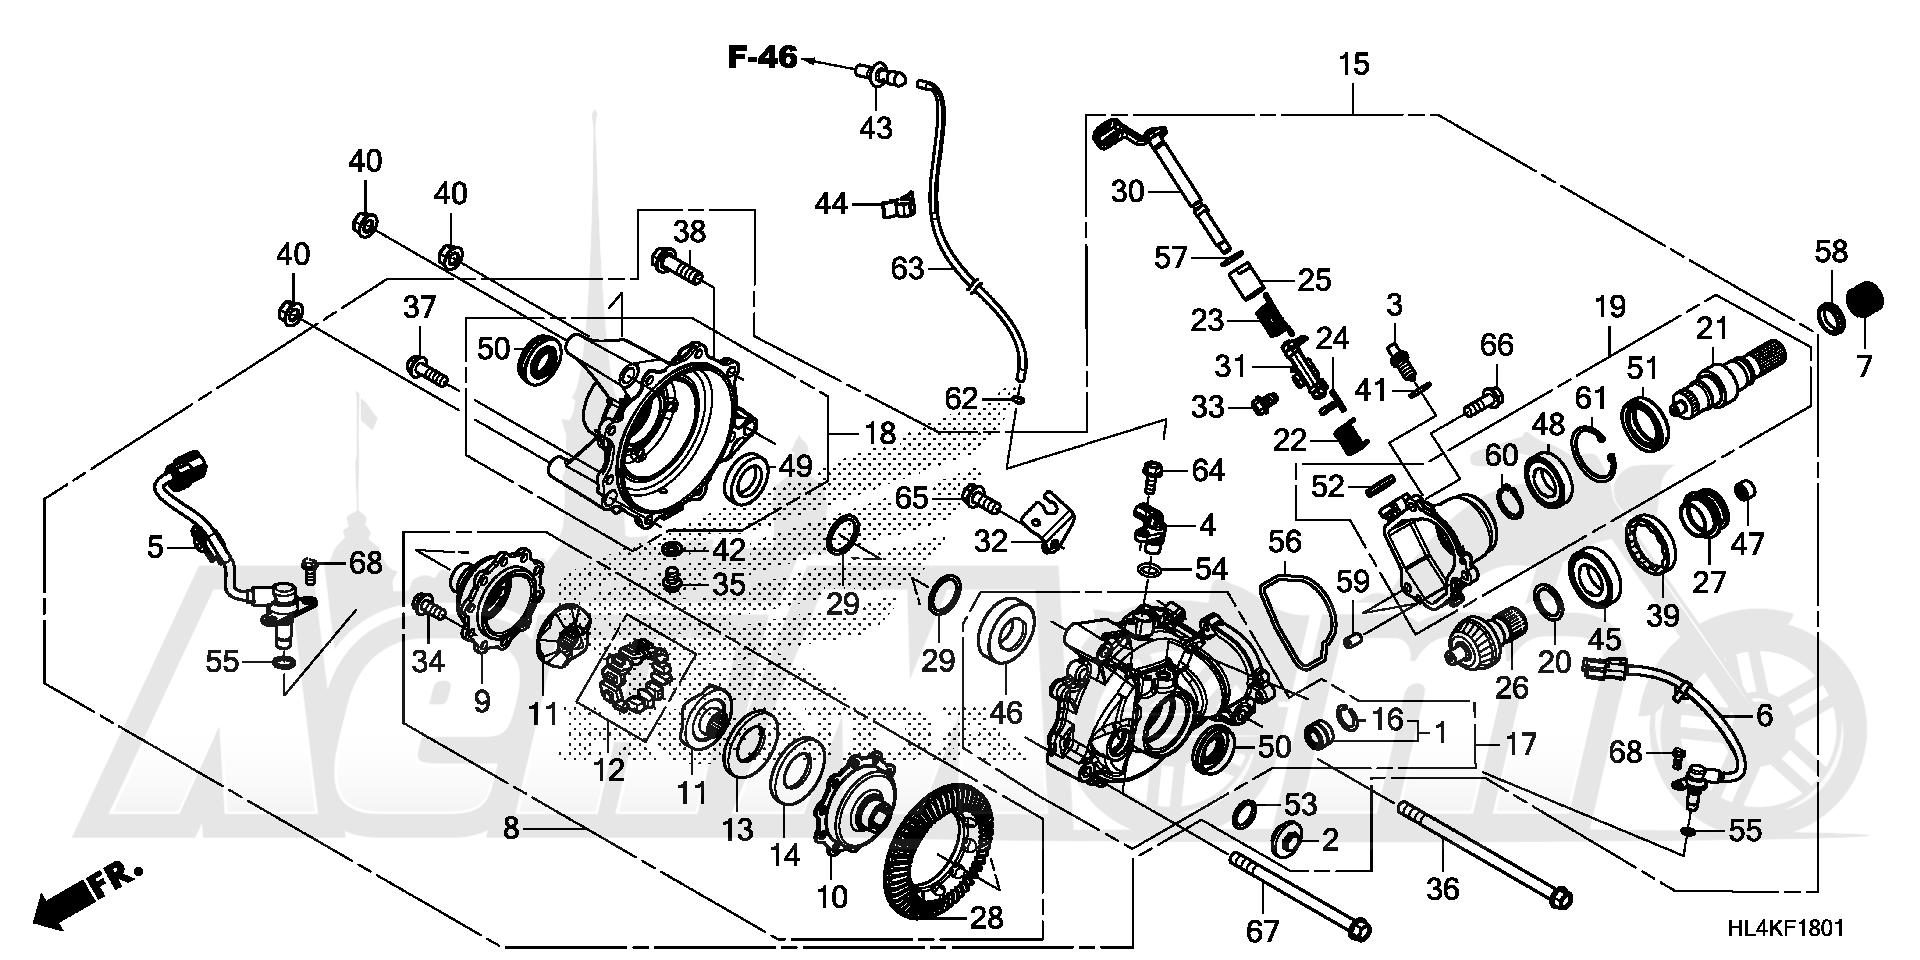 Запчасти для Квадроцикла Honda 2019 SXS1000M3L Раздел: FRONT FINAL GEAR (2) | перед FINAL шестерня (2)